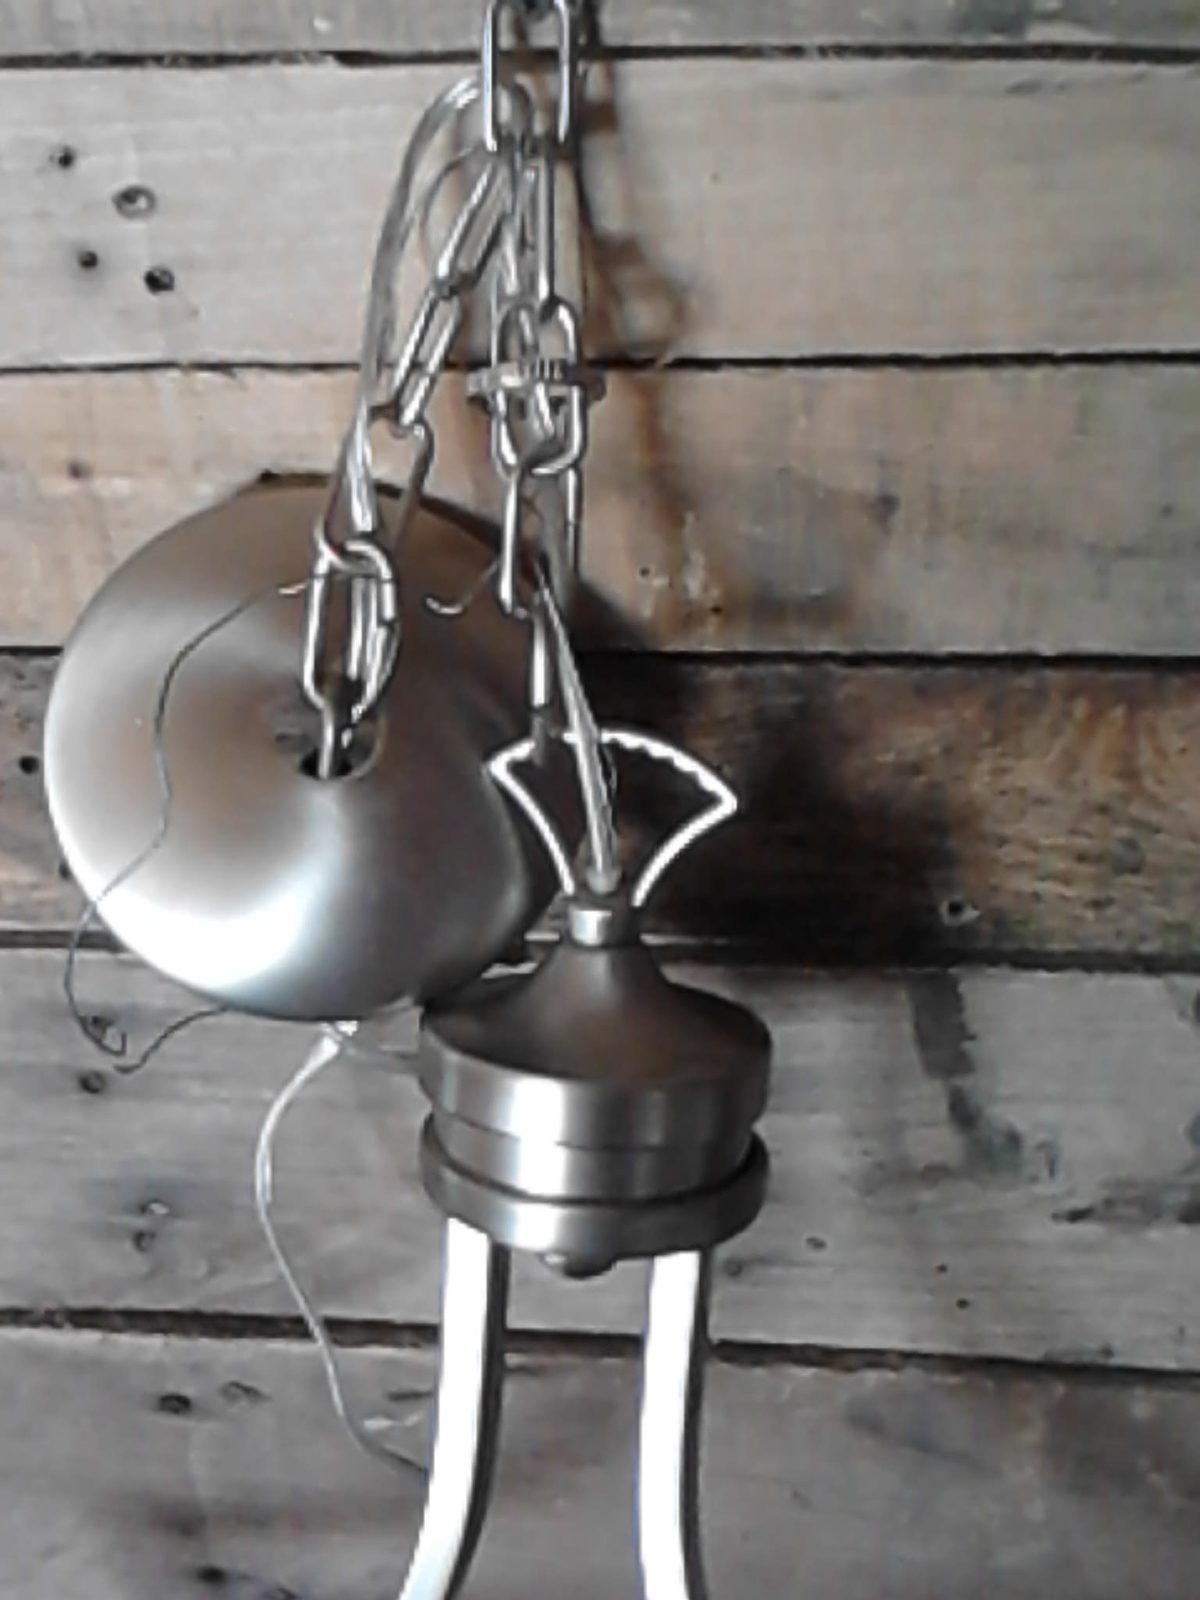 1 Light Pendant Chandelier By Kichler Lighting E14042 34026 Nickel Finished